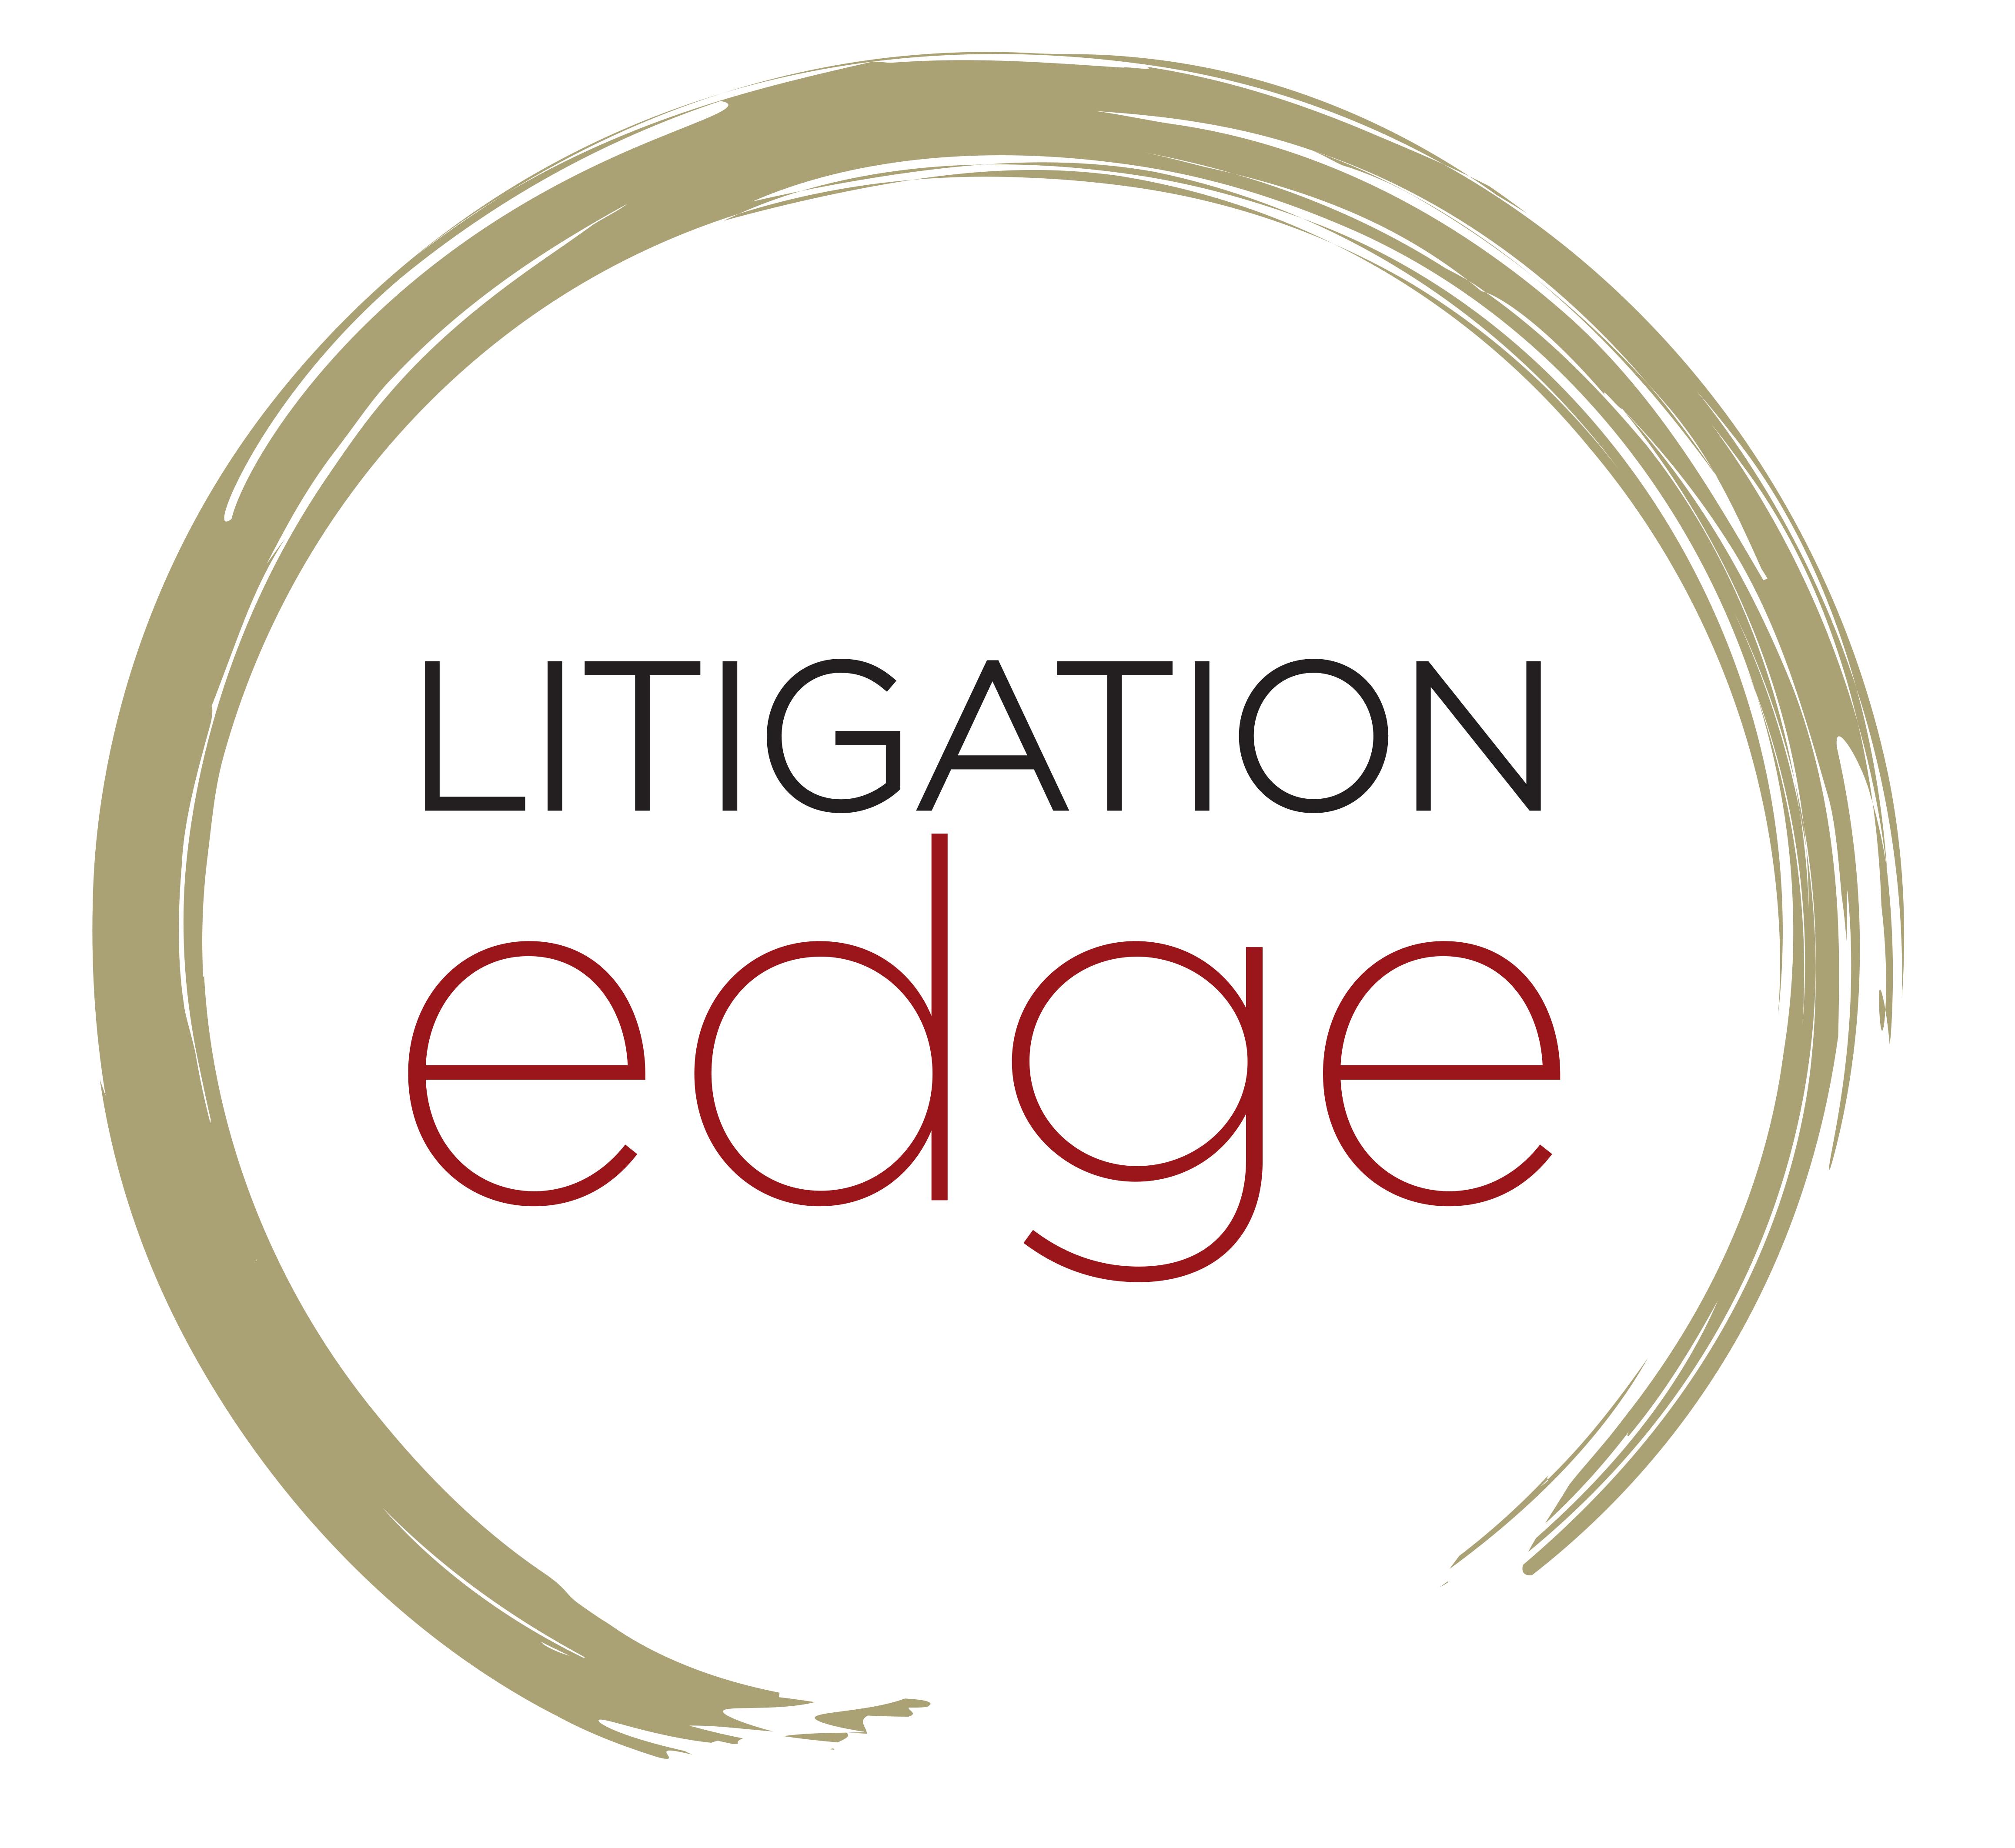 Litigation Edge Extends Legal Technology Training Partnership with Temasek Polytechnic